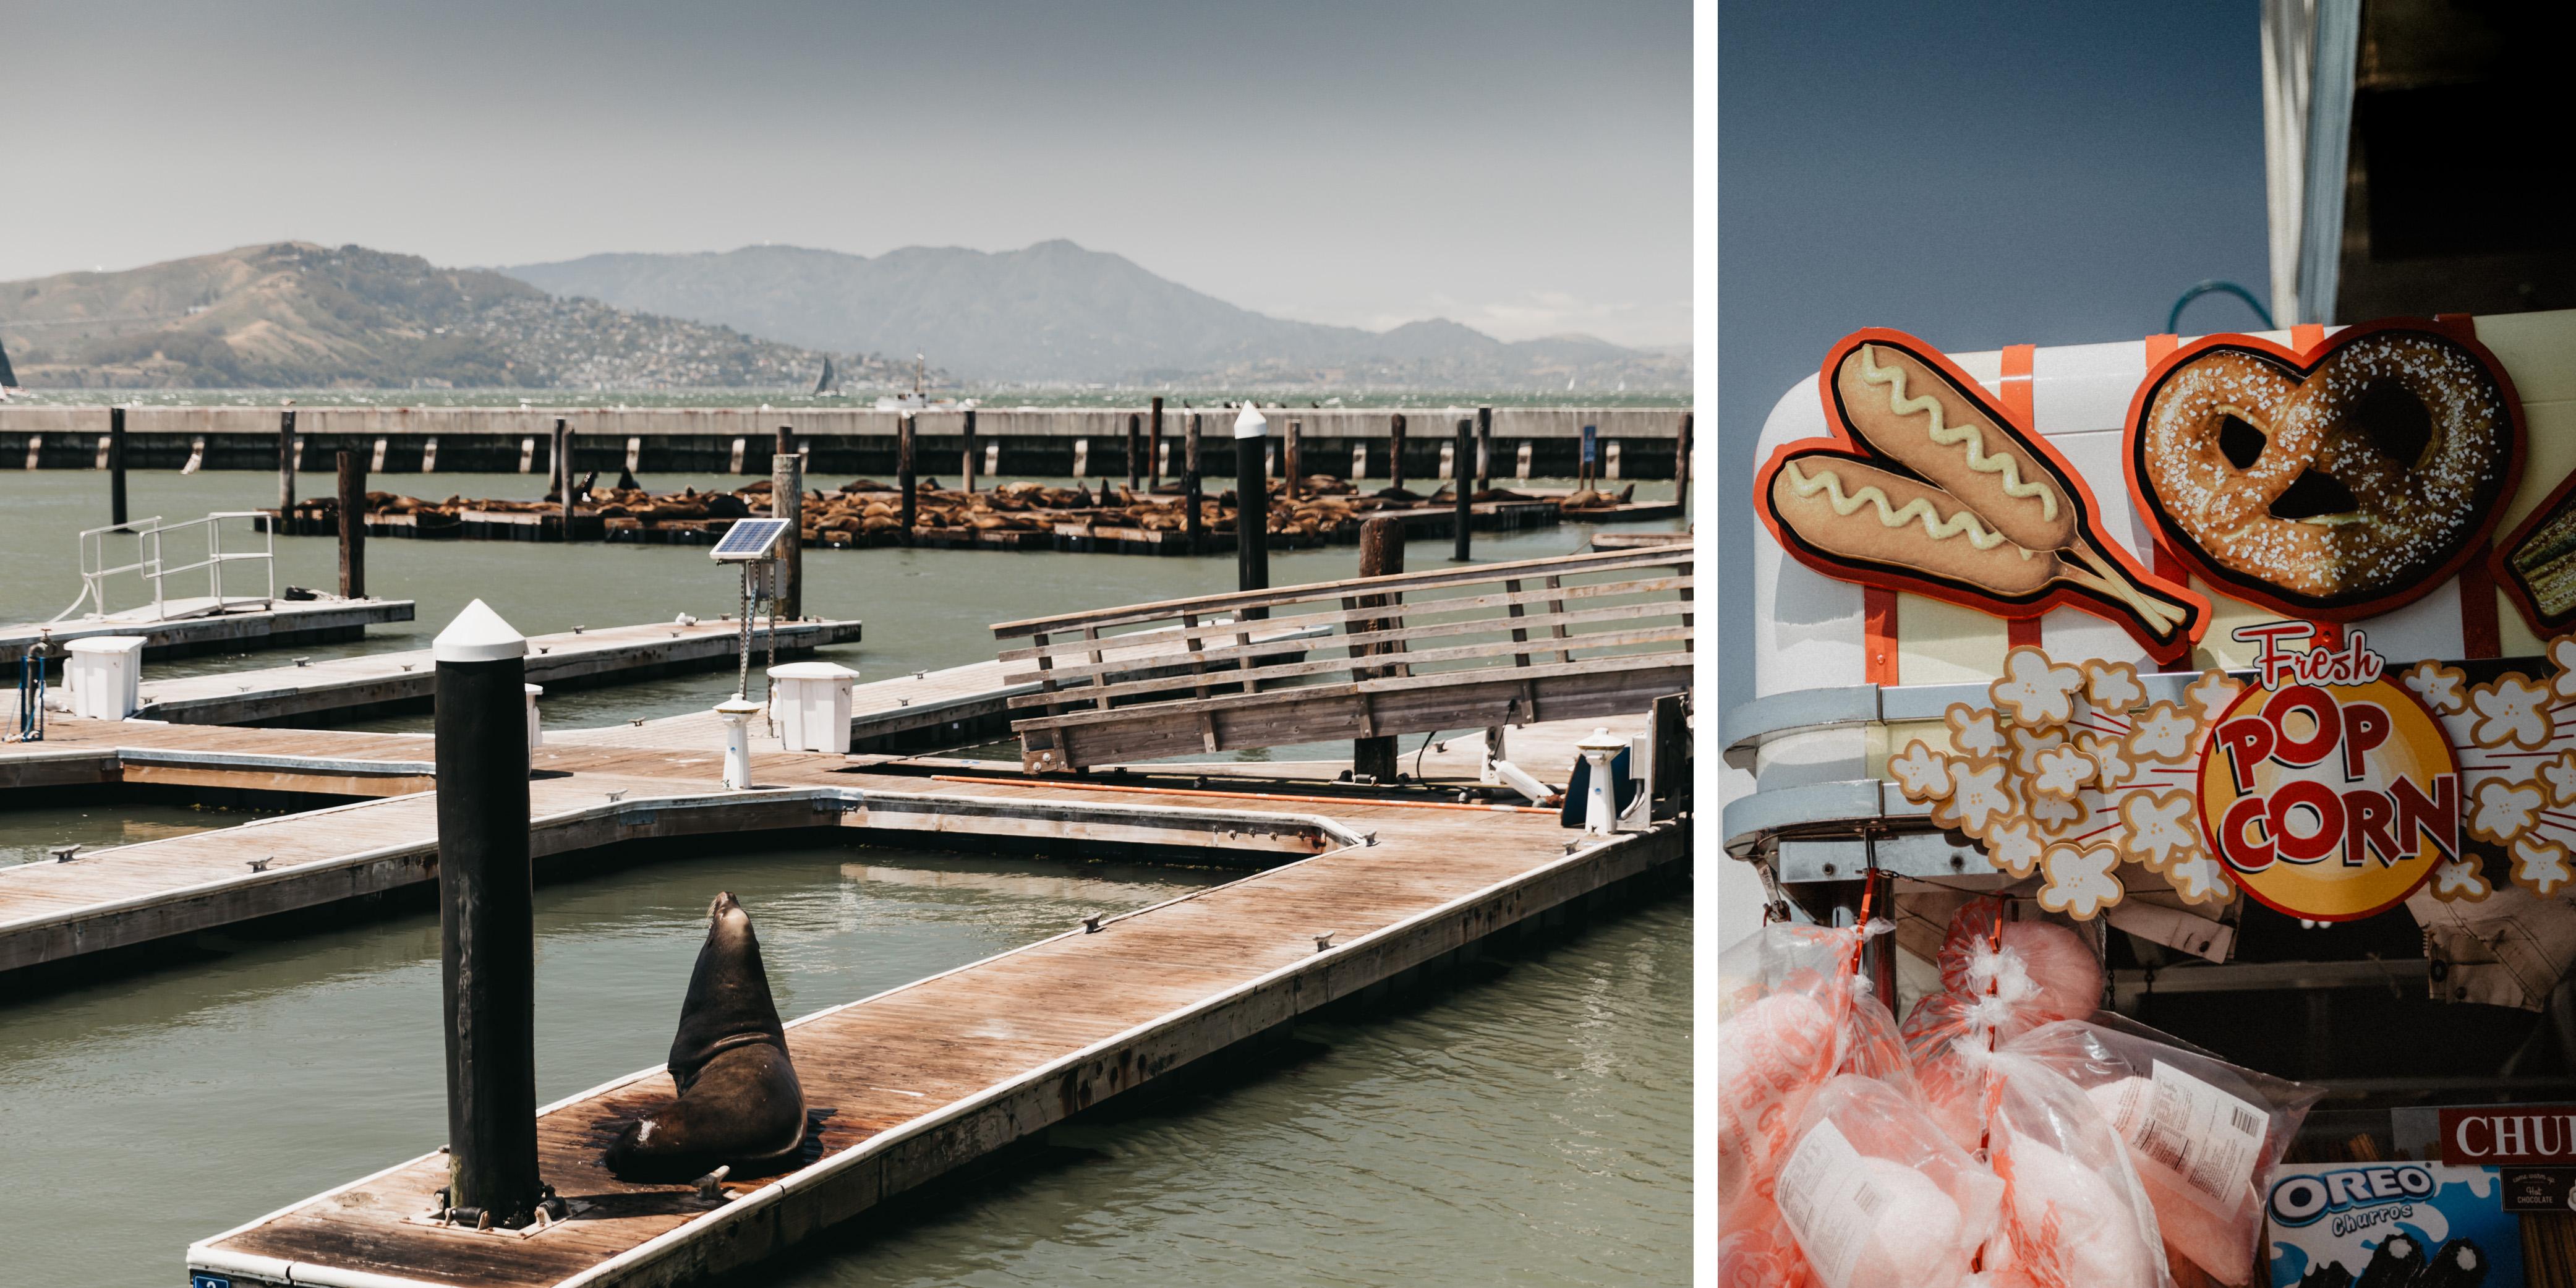 Pier 39 Seelöwen Fishermans Wharf in San Francisco Frühjahr